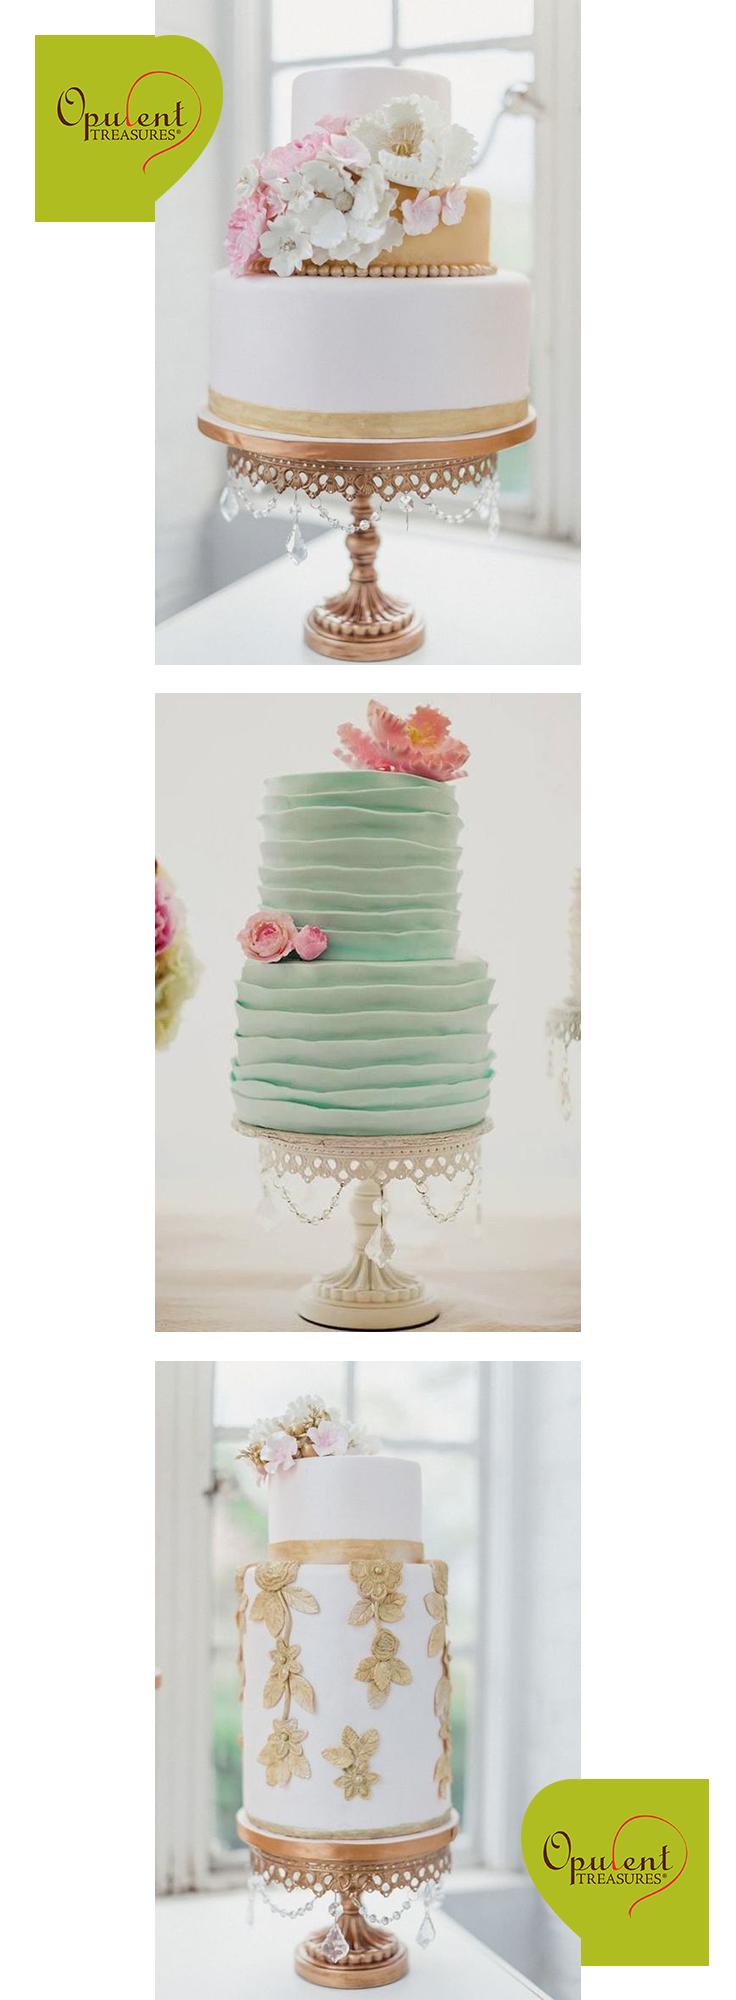 Opulent-Treasures-Cake-stands.png